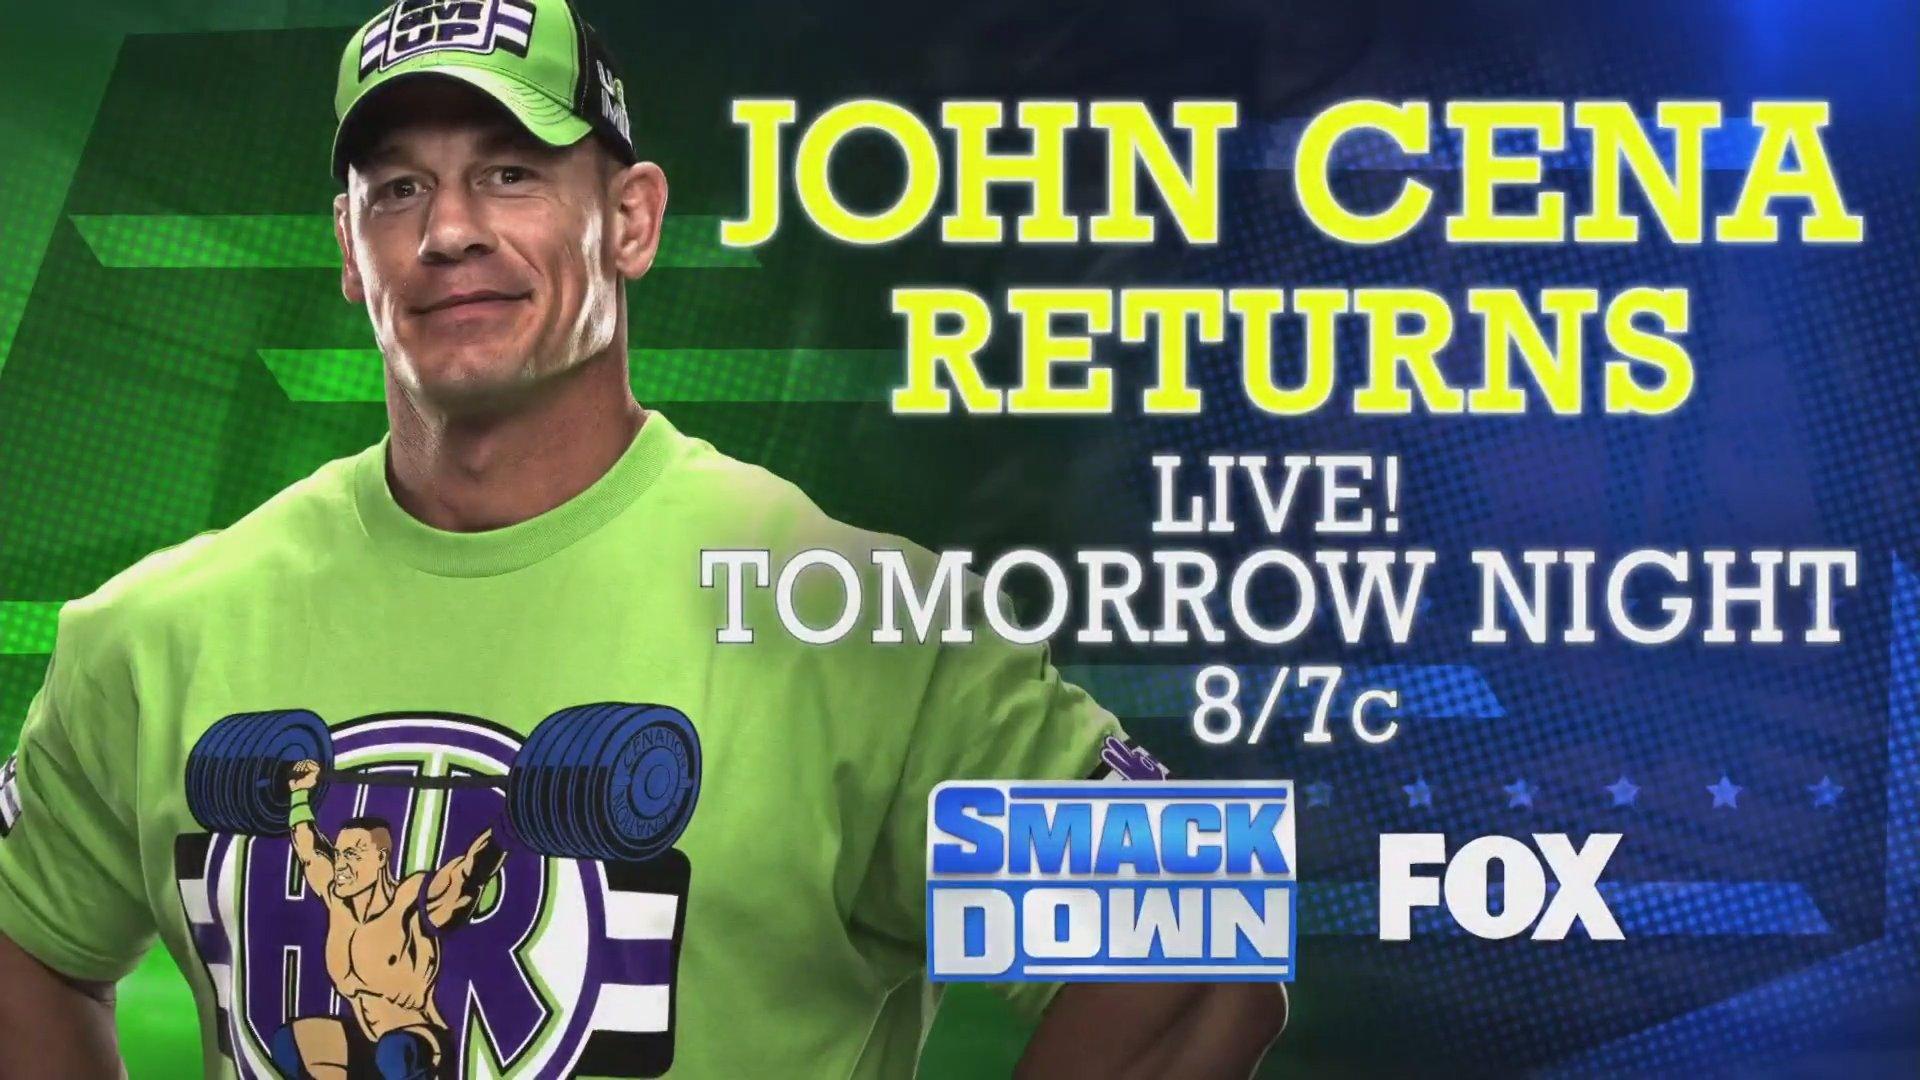 WWE Smackdown Preview (28/02/20): John Cena Returns; Super Showdown Fallouts 1